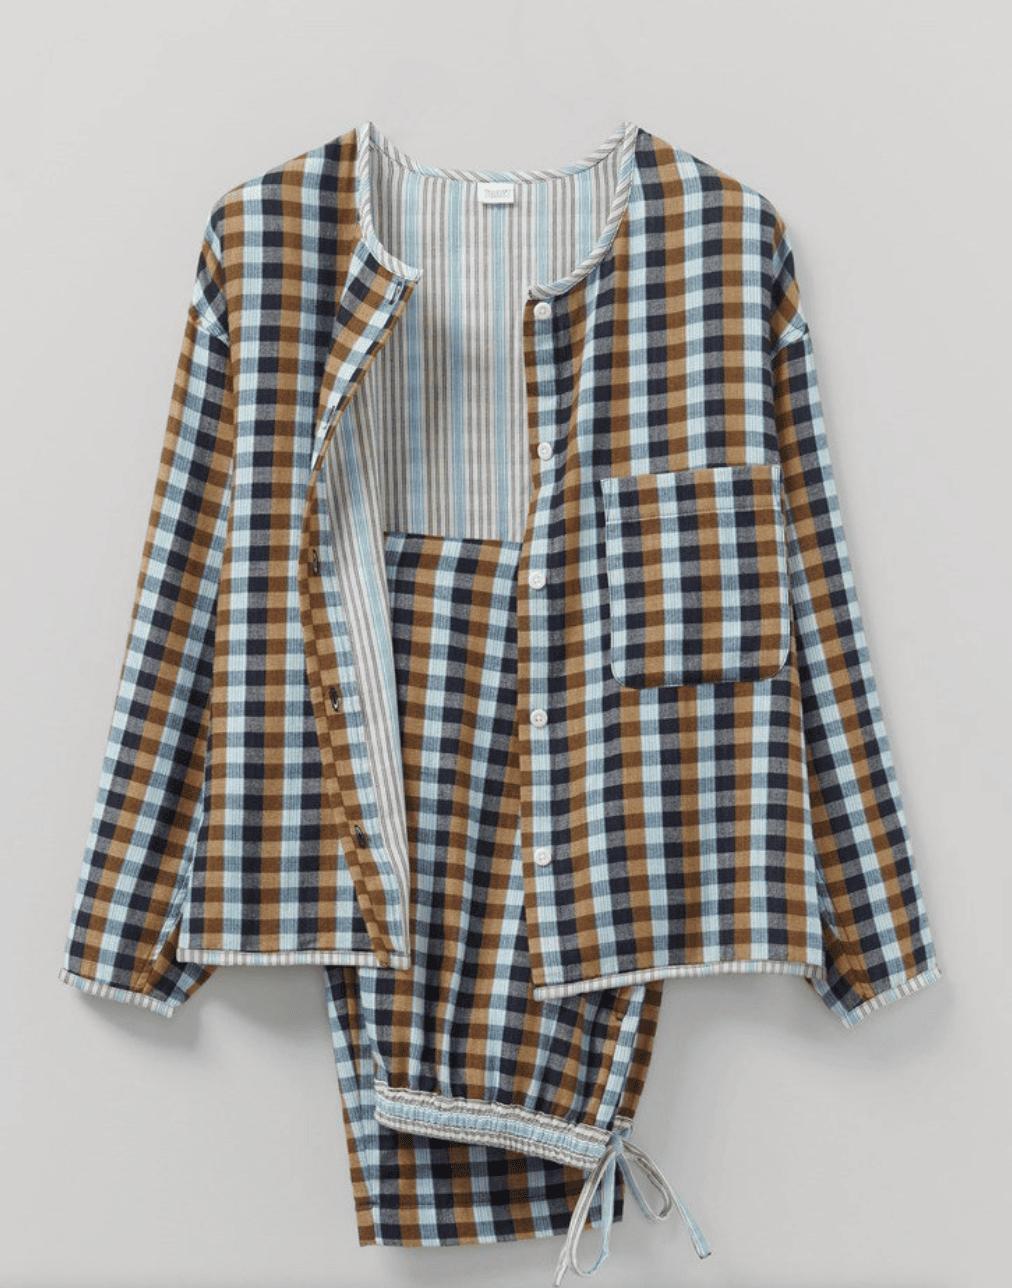 woven pajamas from Toast